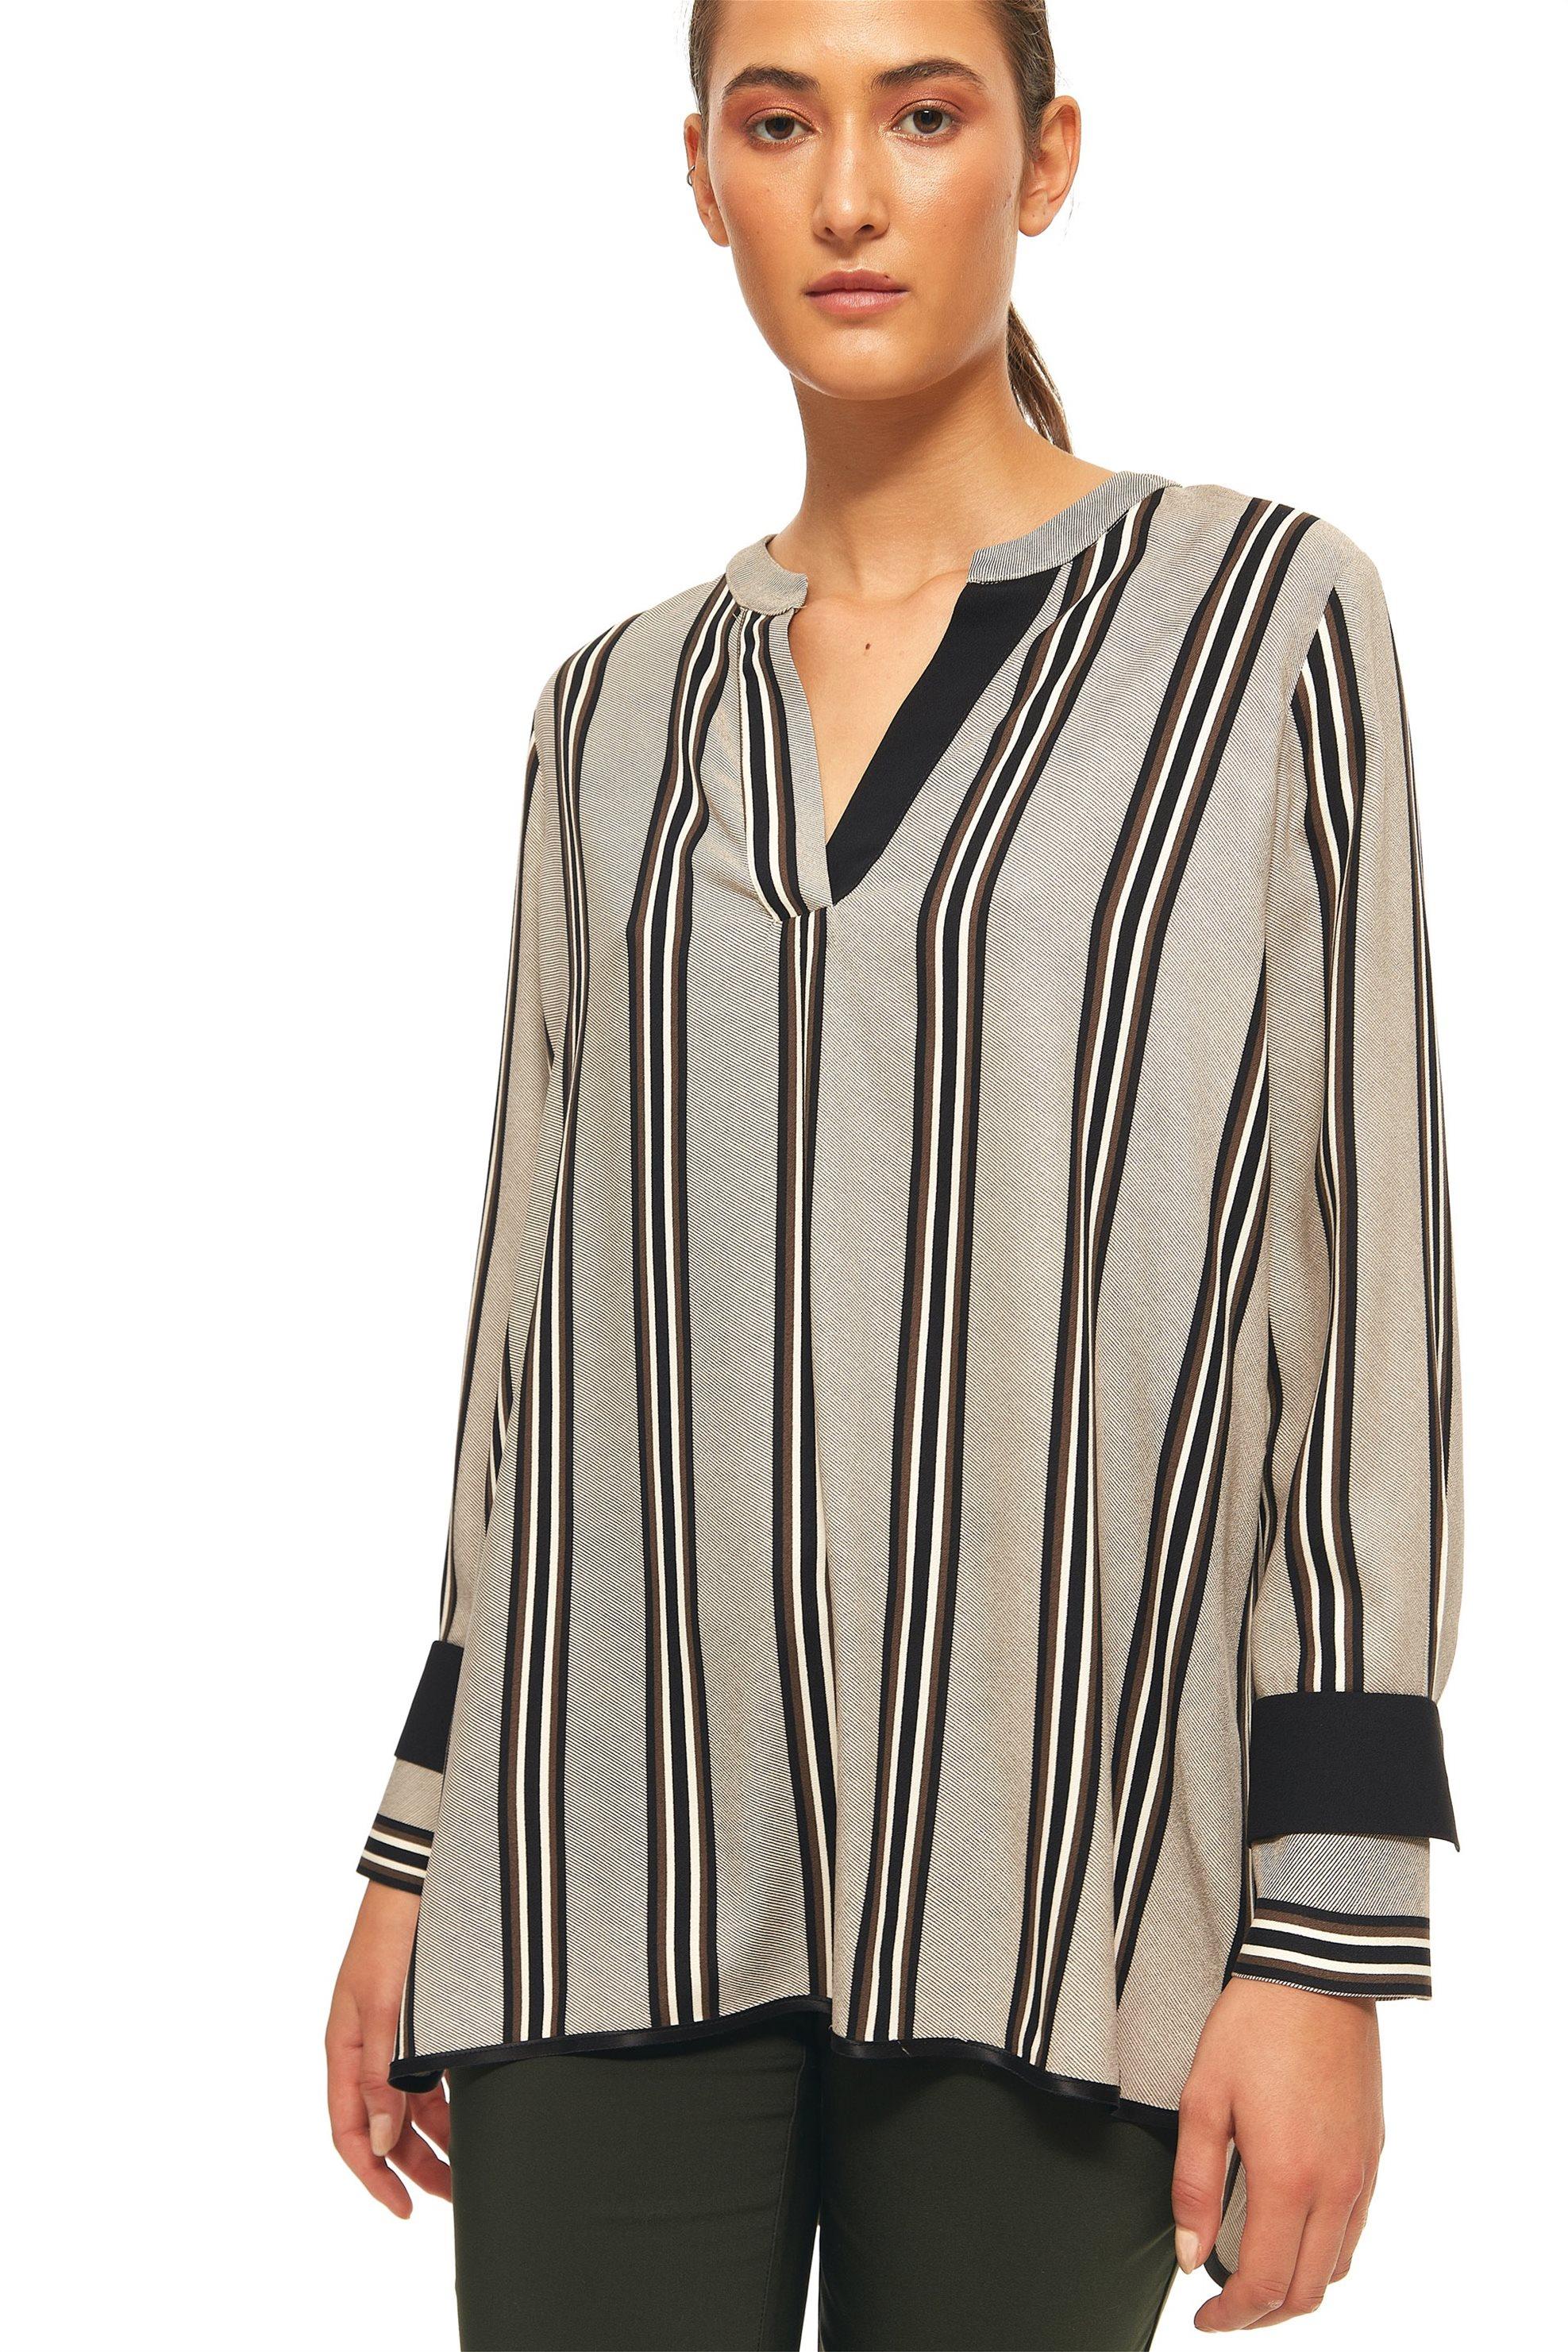 Bella P γυναικεία μπλούζα με λαιμόκοψη V και ρίγες loose fit - 21.182.Β04.105 -  γυναικα   ρουχα   tops   πουκάμισα   μπλούζες   casual   πουκαμίσες   καφτάνια